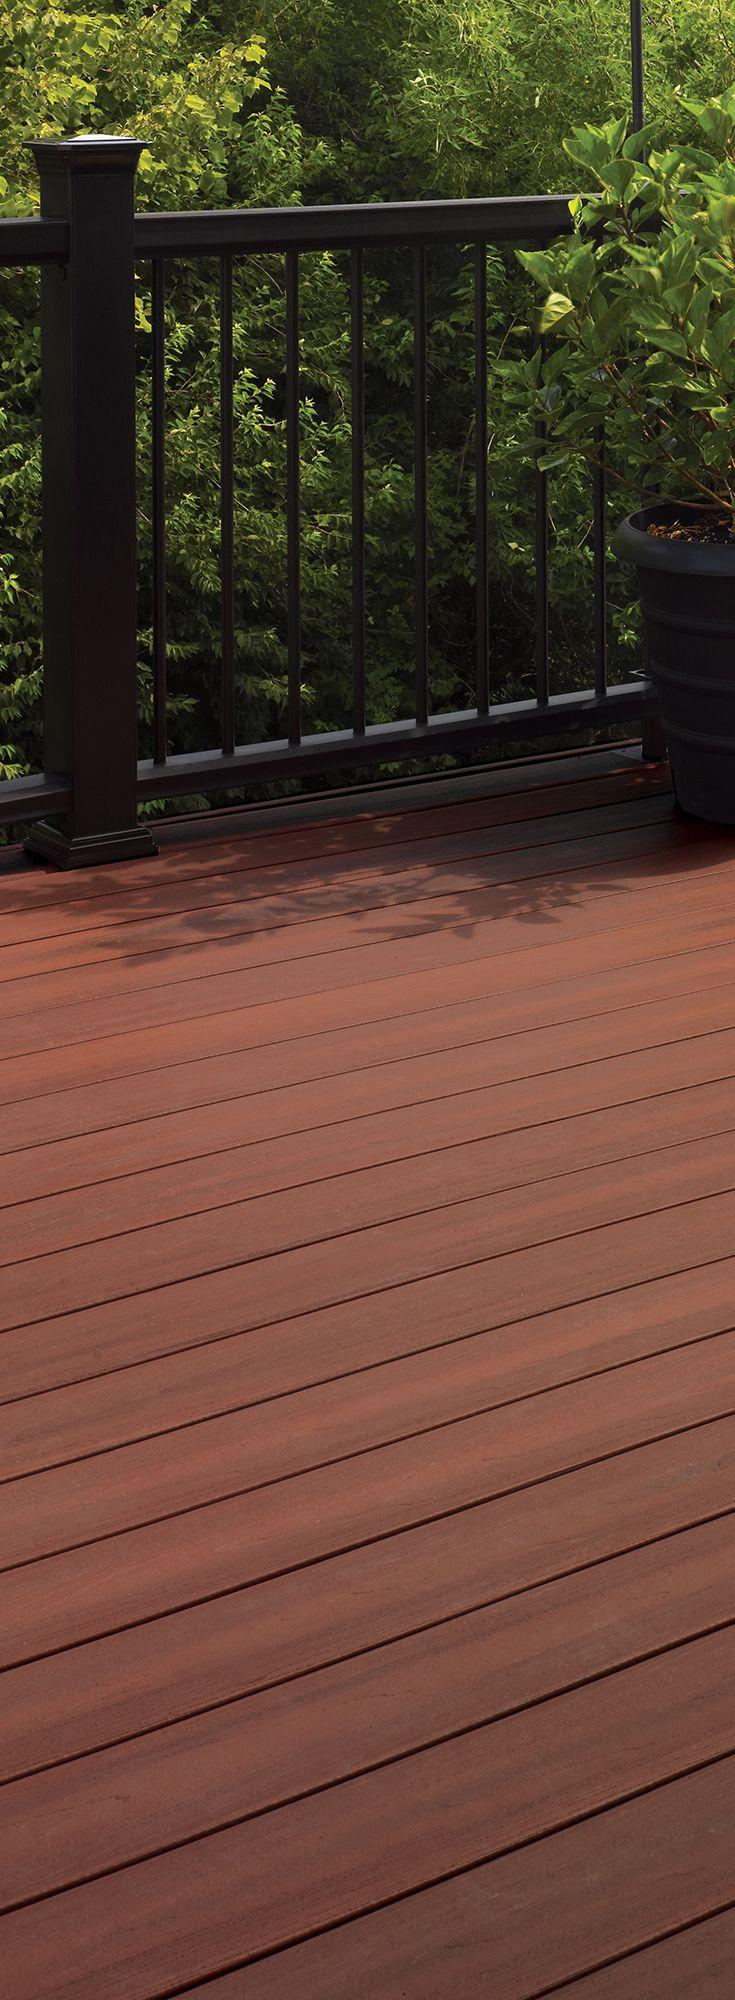 371 best images about composite decks by fiberon on for Vinyl decking materials